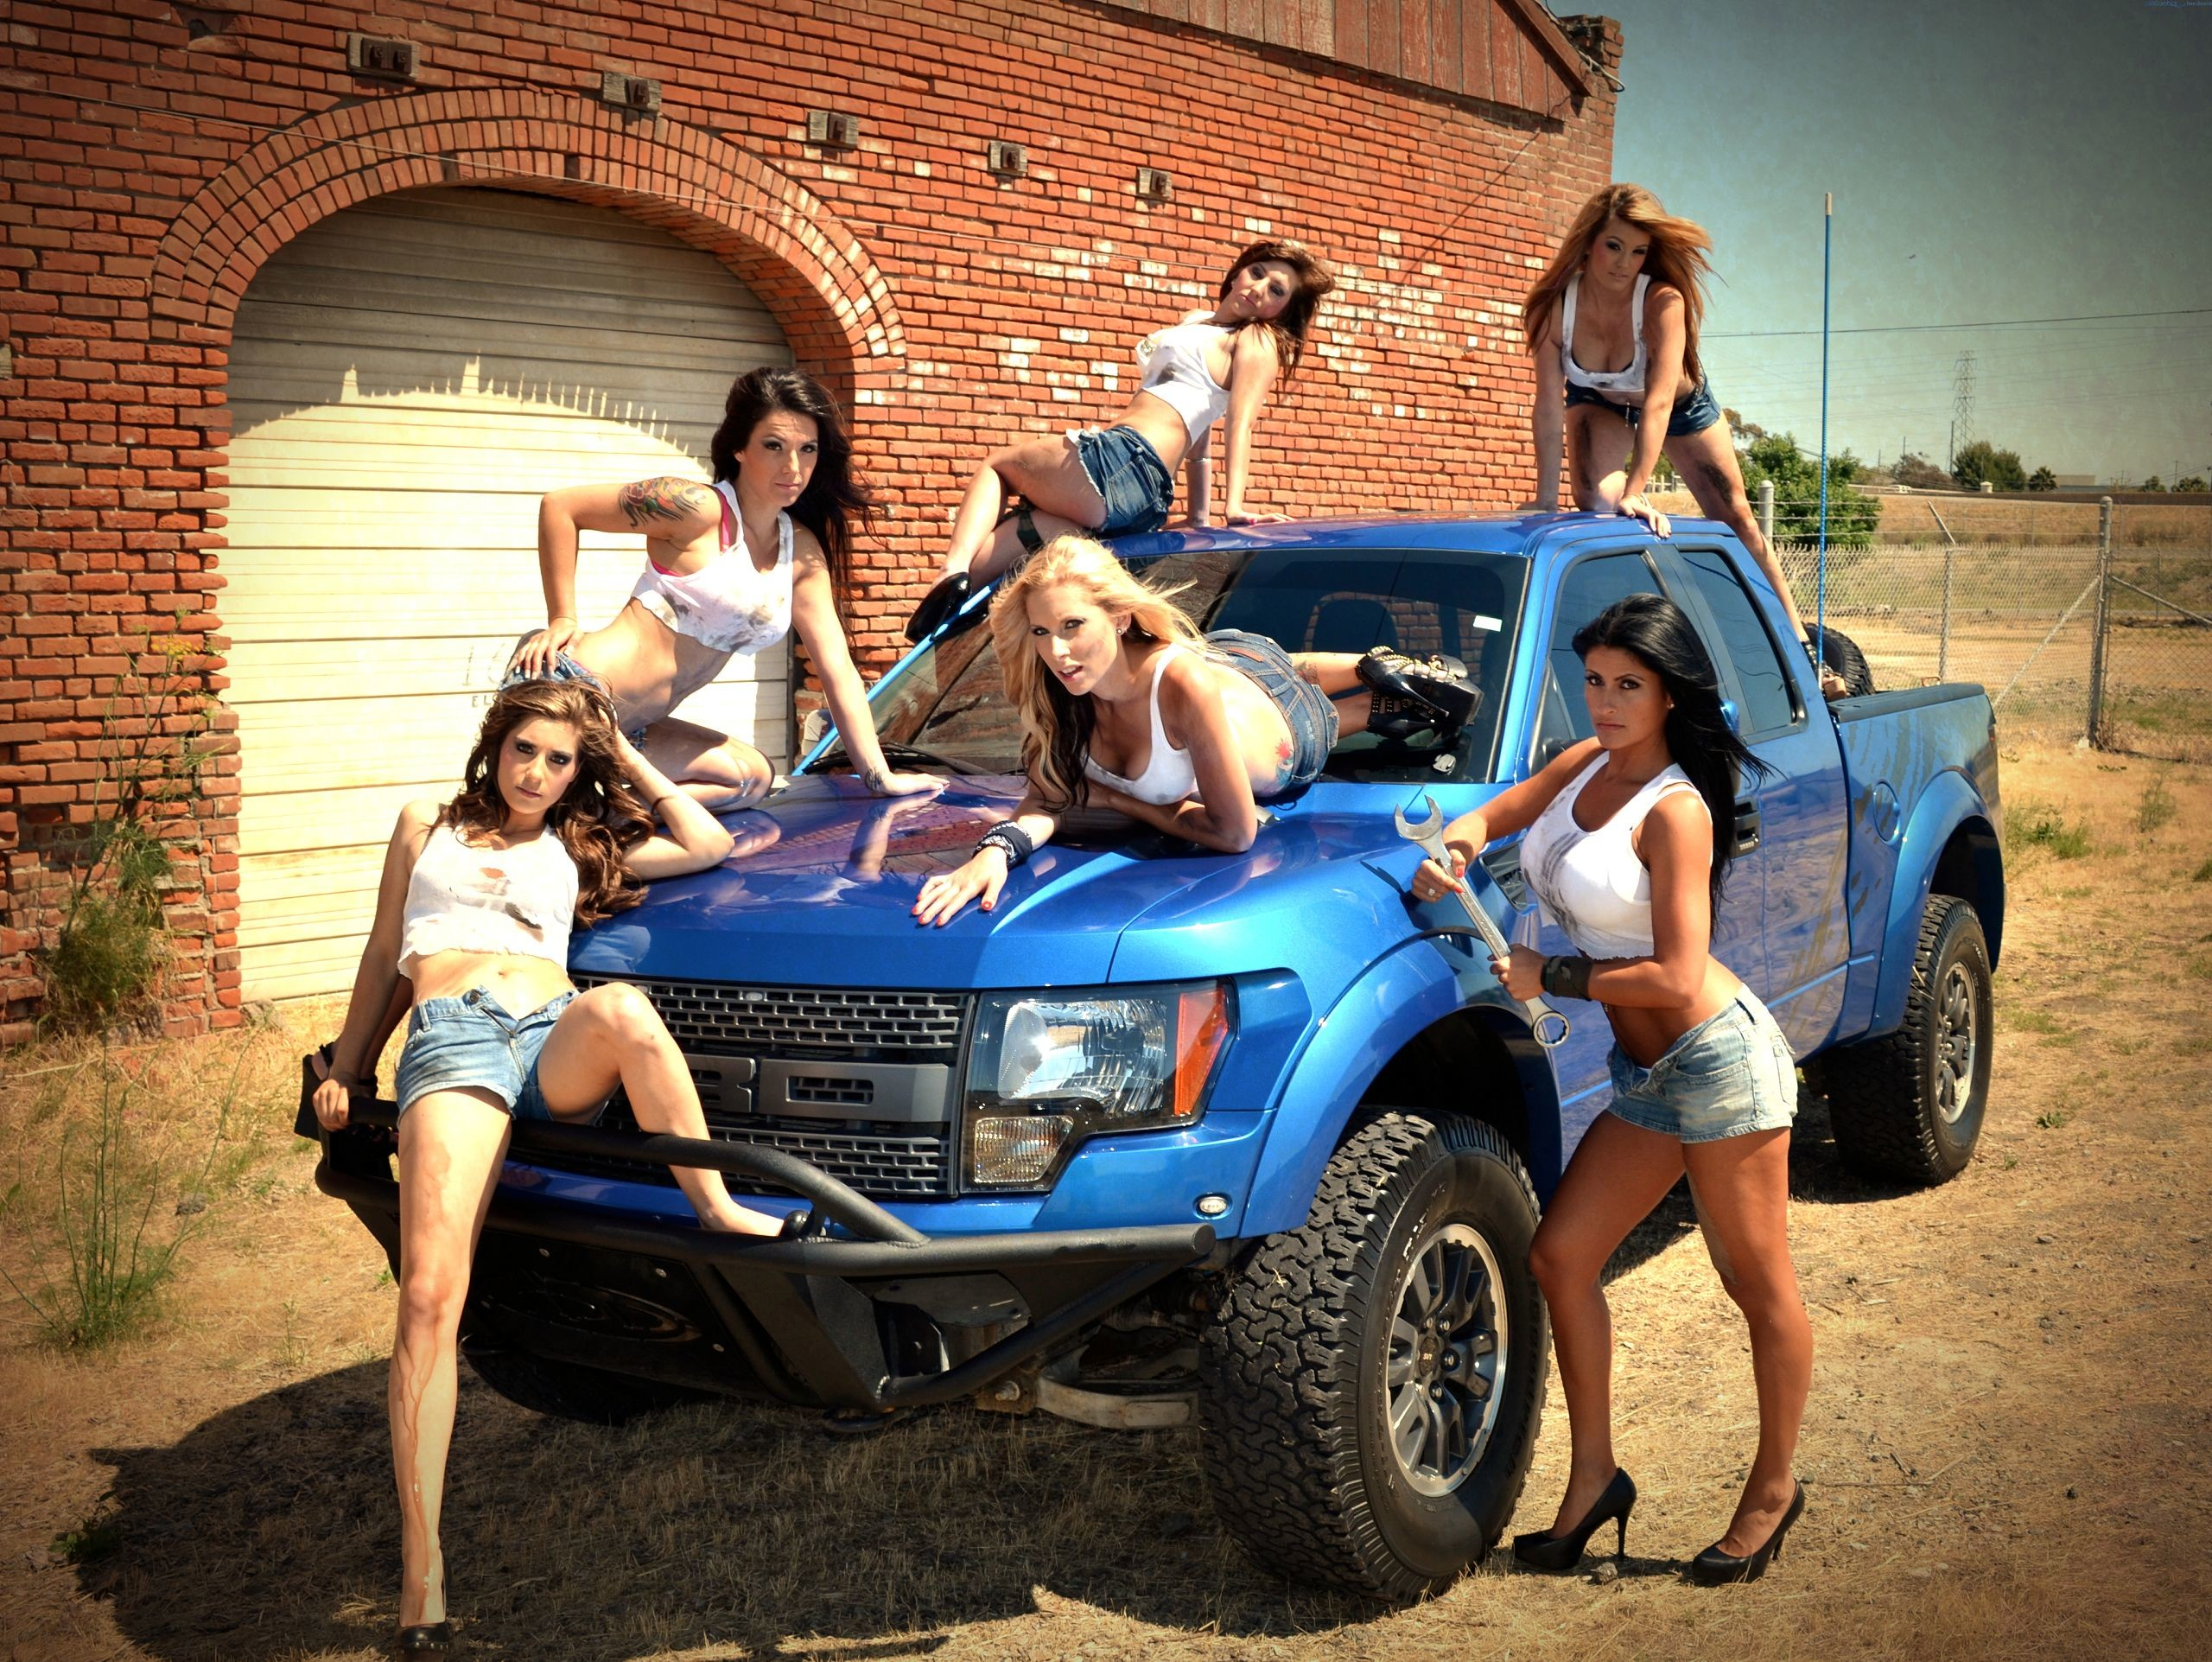 Hot girls and big trucks. Ford SVT Raptor